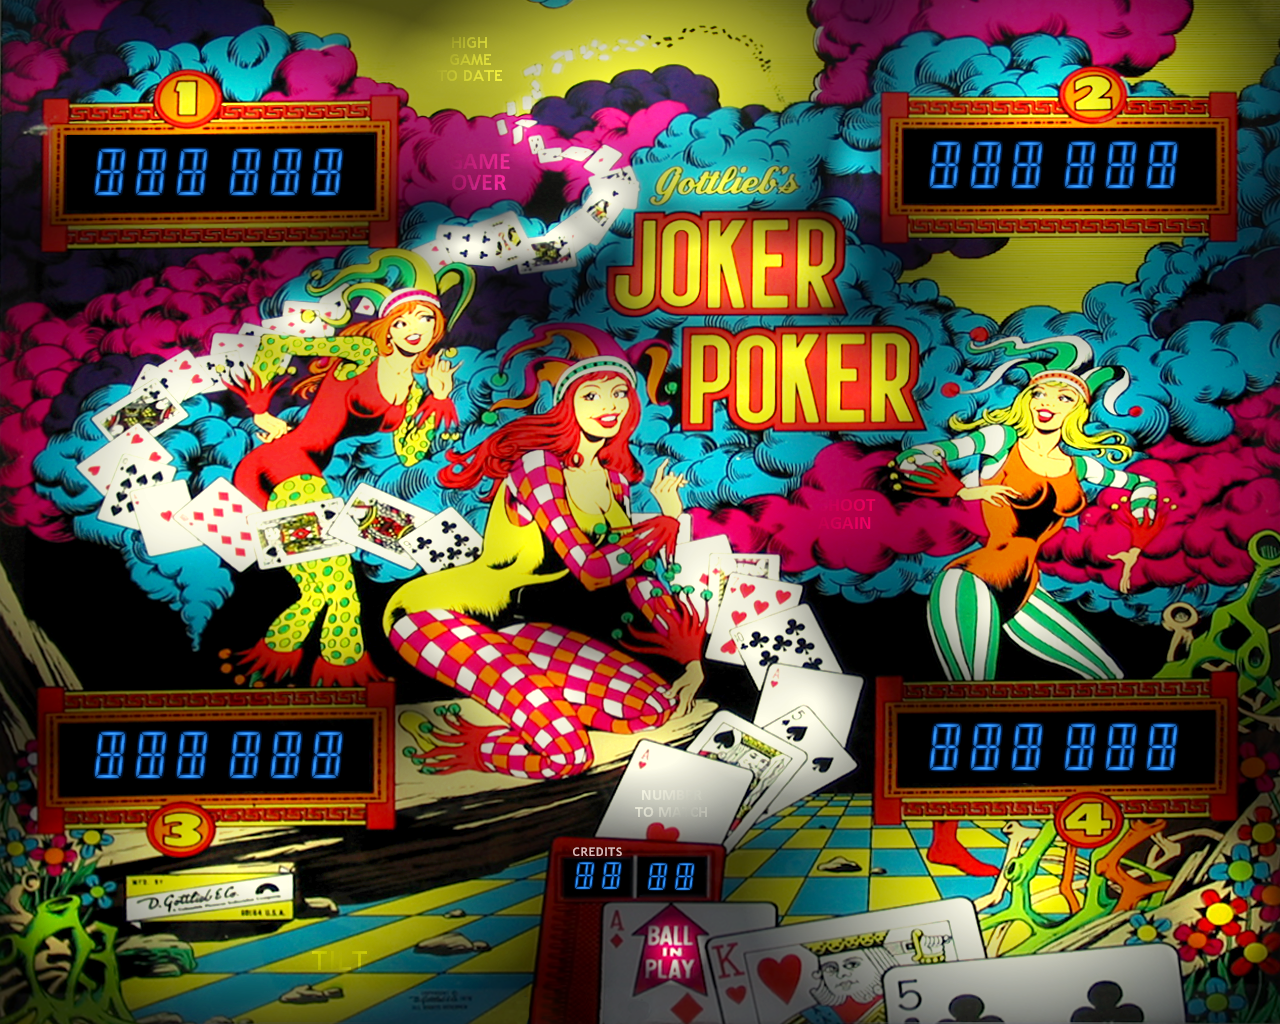 Joker Poker Gottlieb 1978 Directb2s Vpforums Org